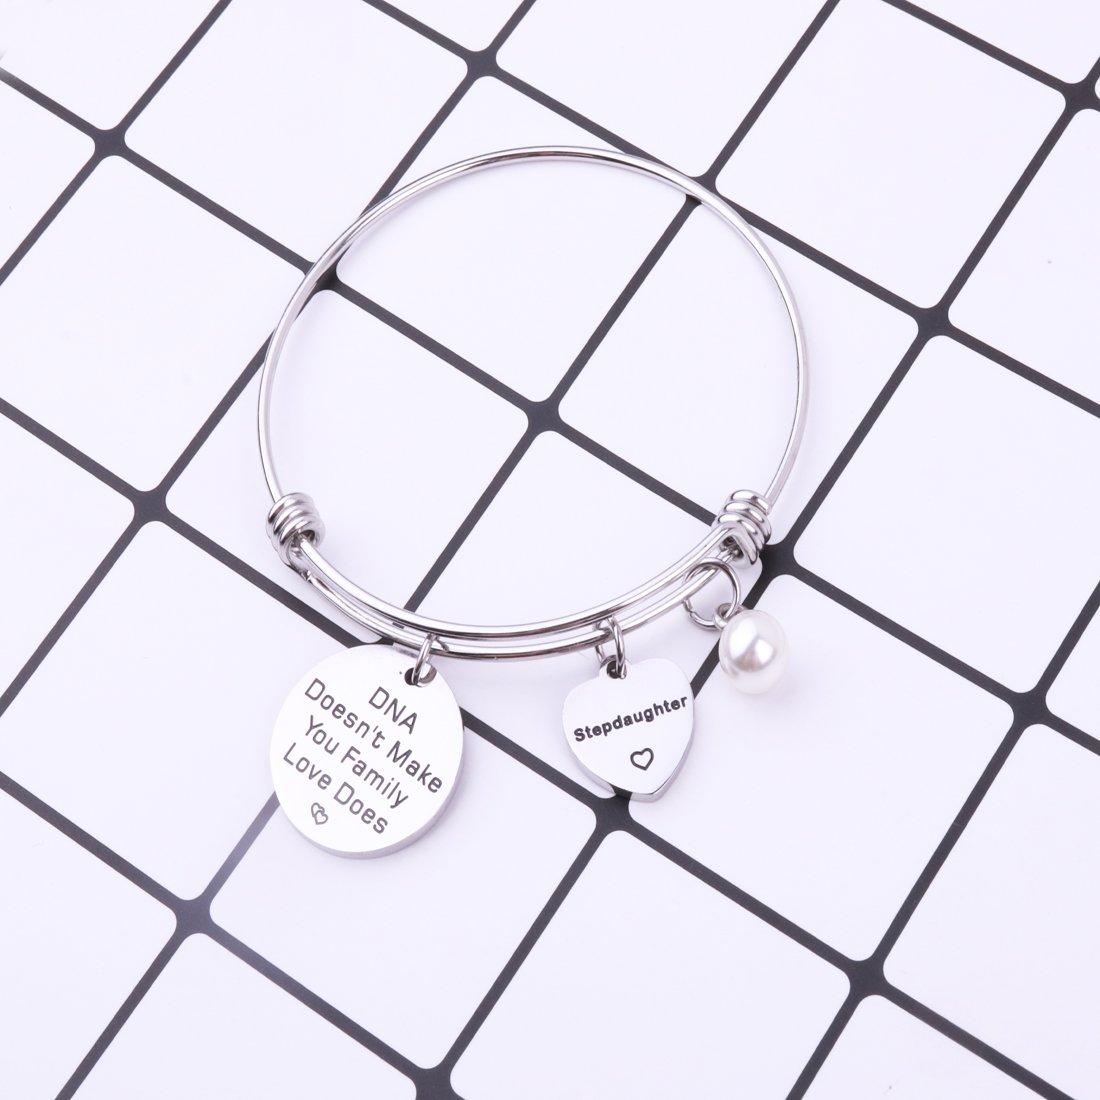 REEBOOOR Adoption Gift Stepdaughter Bracelet DNA Doesnt Make You Family Love Does Gift for Adoption,Stepchild